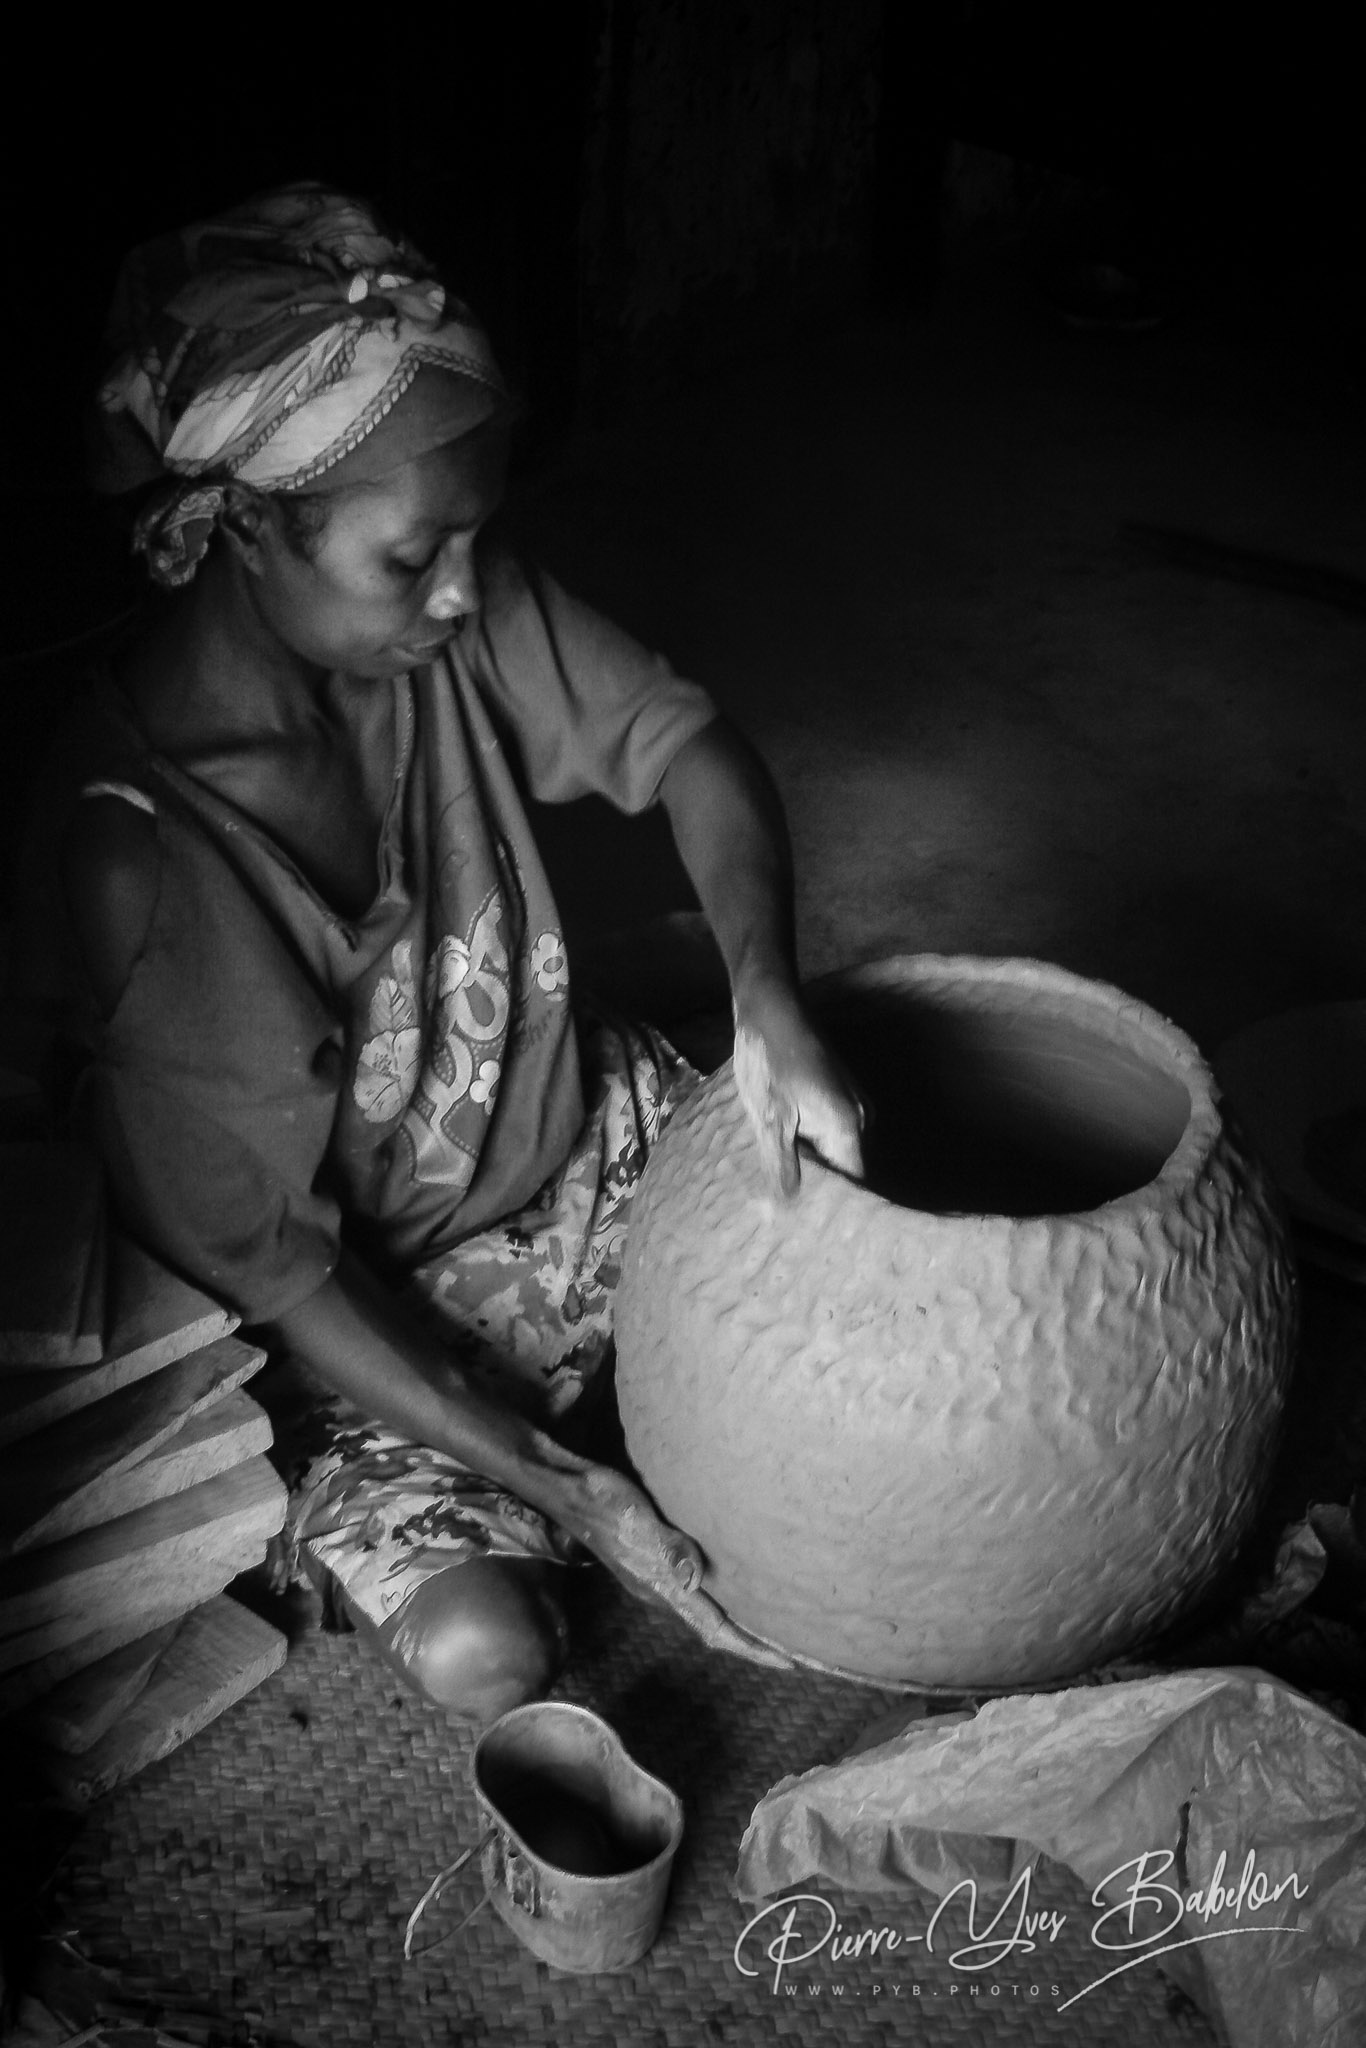 Artisanat de poterie à Fianarantsoa, Madagascar